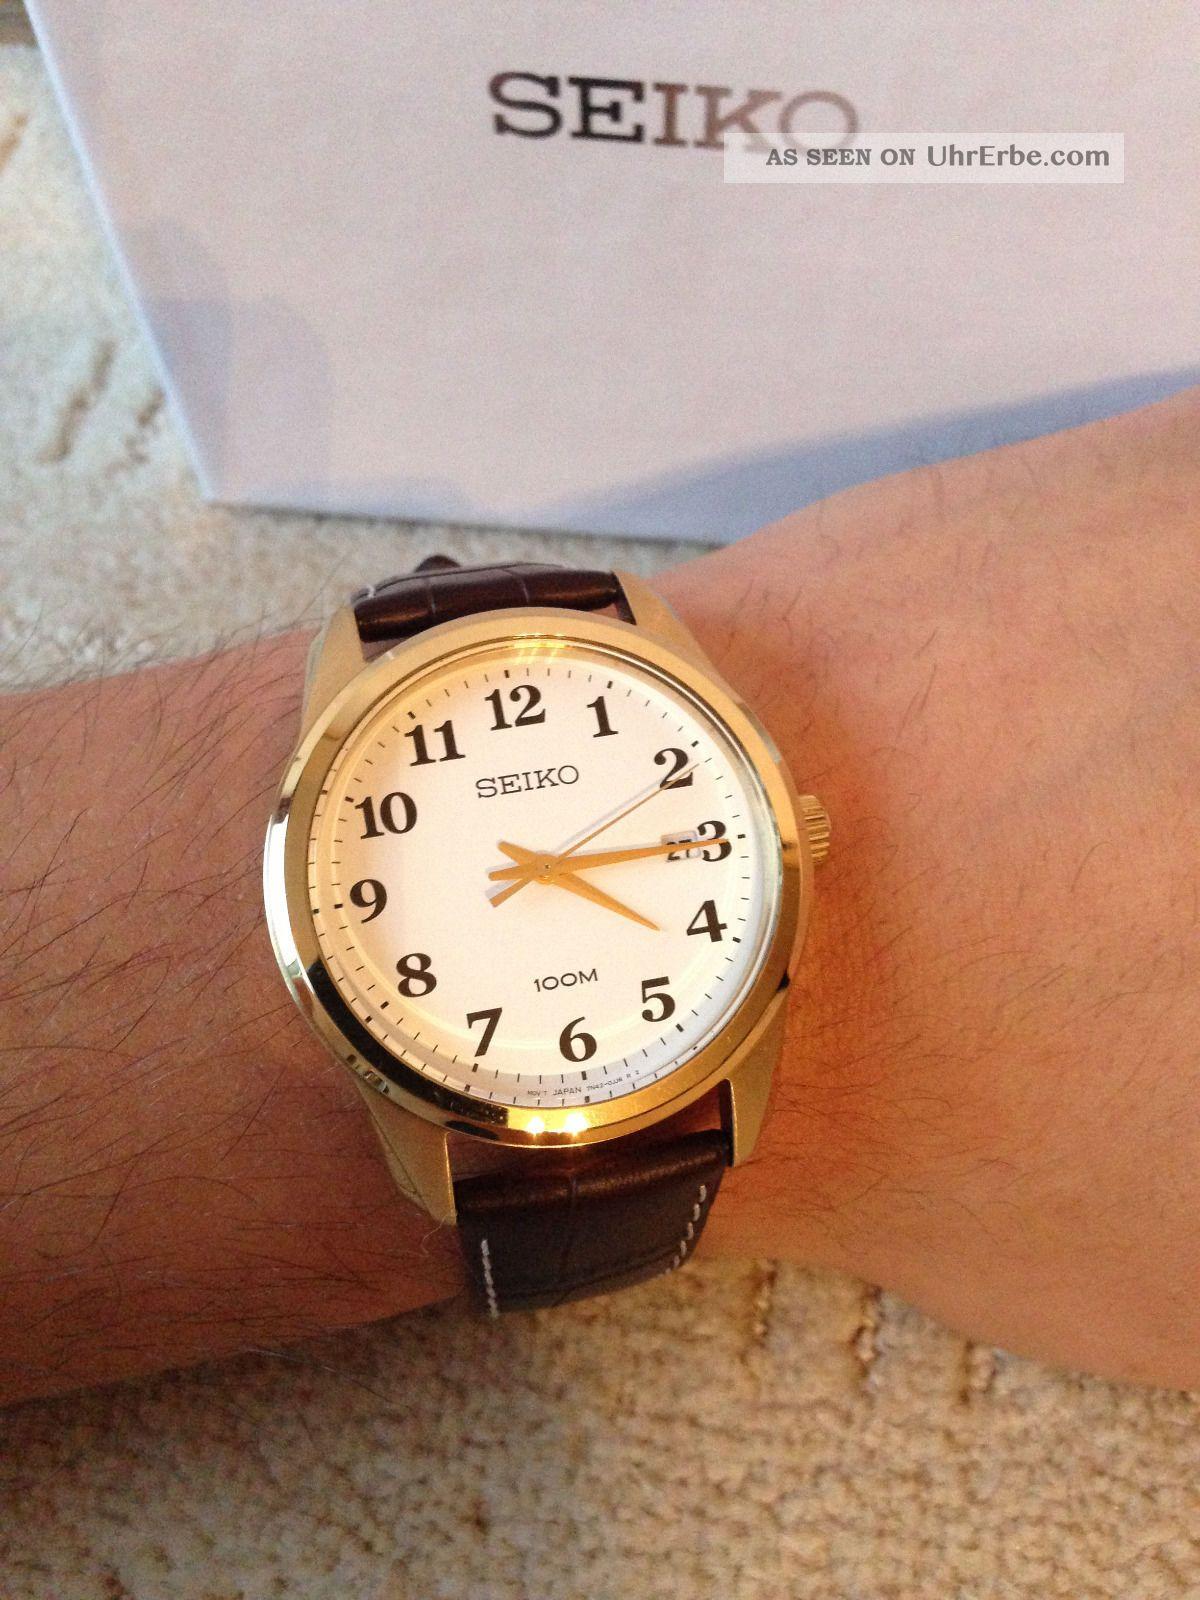 BraunZiffernblatt UhrHerrenLederarmband WeißTop Seiko Seiko Originale BraunZiffernblatt Originale UhrHerrenLederarmband WeißTop OkZuPiTlwX